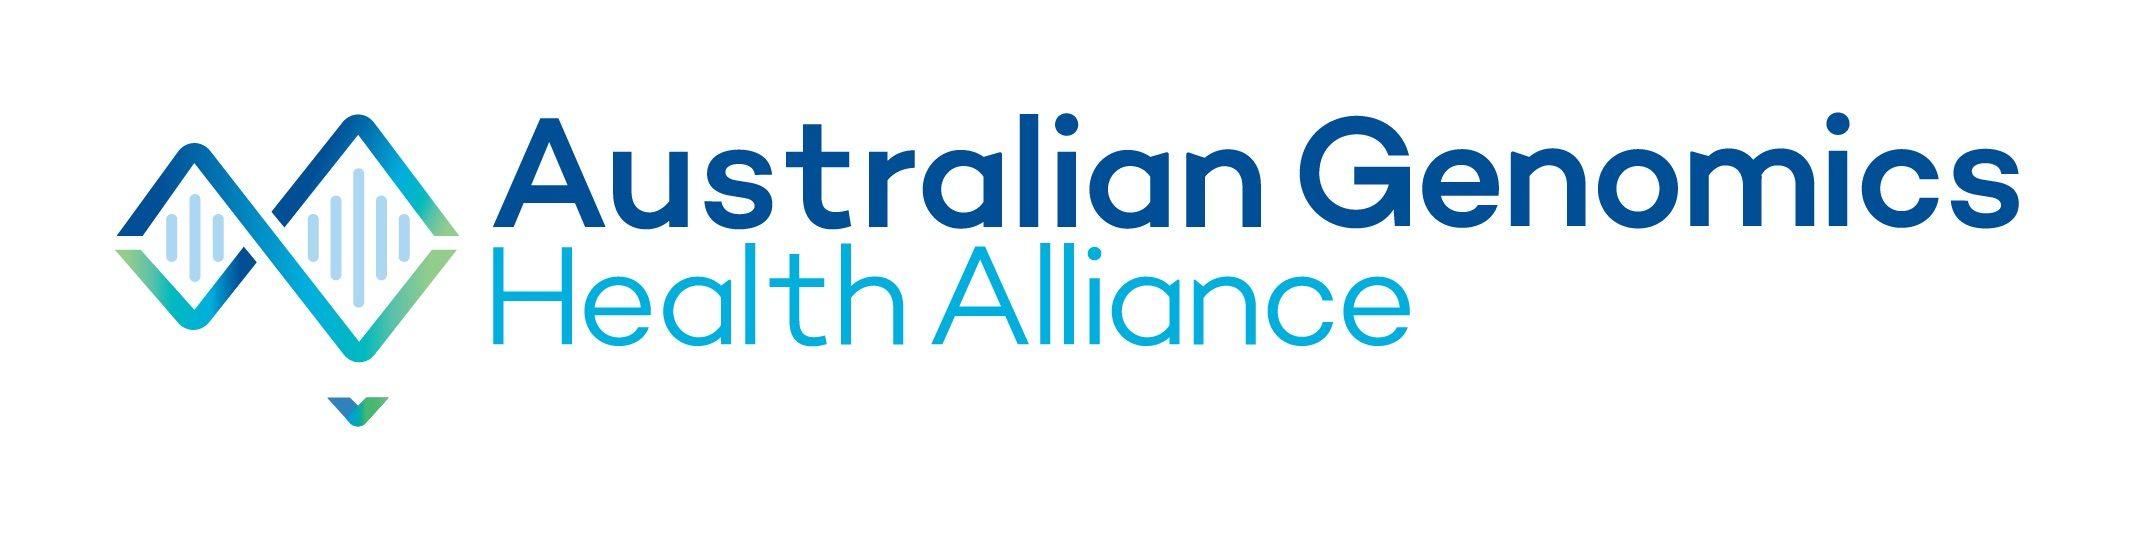 Australian Genomics Health Alliance Australian Genomics